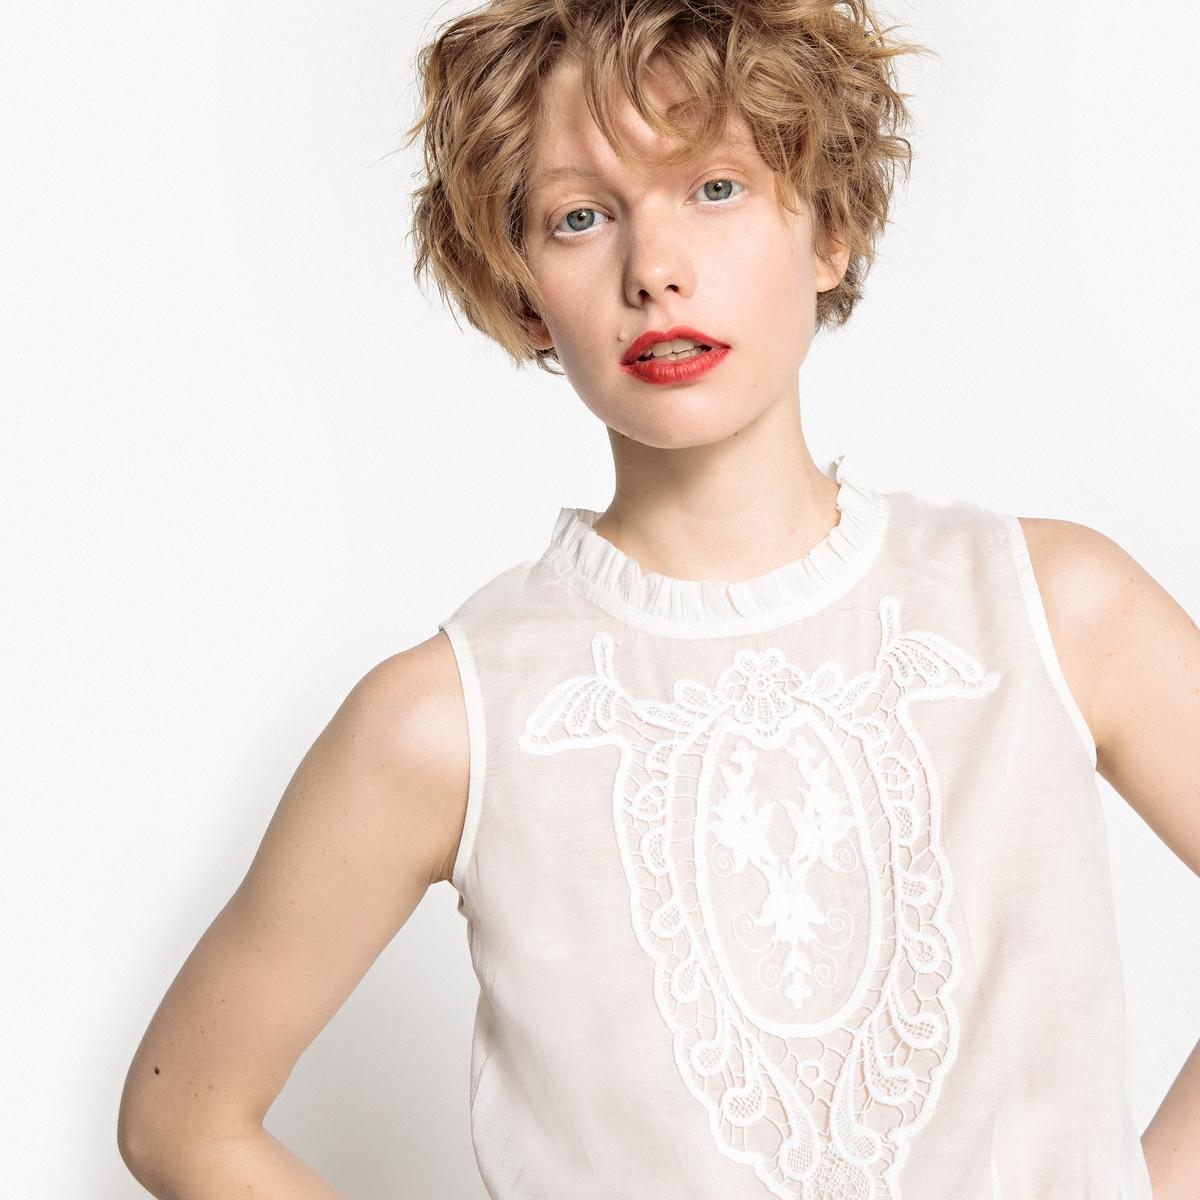 Блузка без рукавов, присборенная на поясе